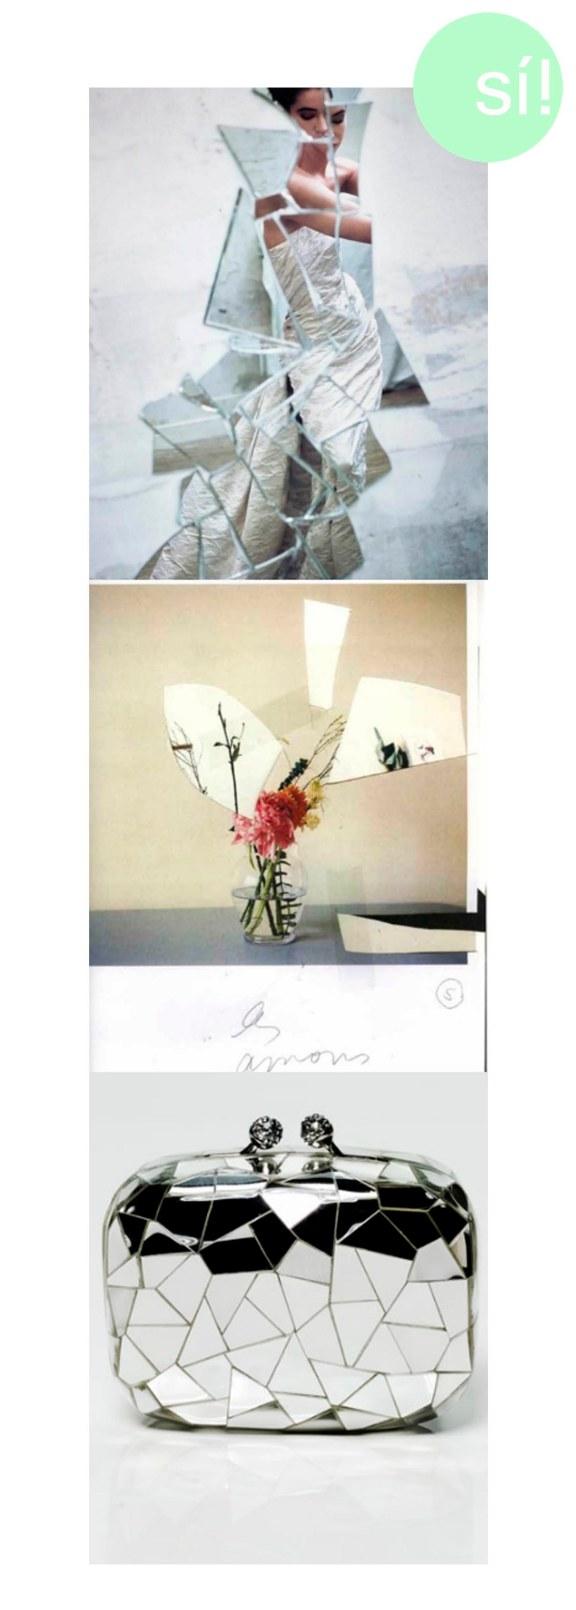 1. loveandpleasure.tumblr.com, 2.Camille Henrot, 3.vogue.com